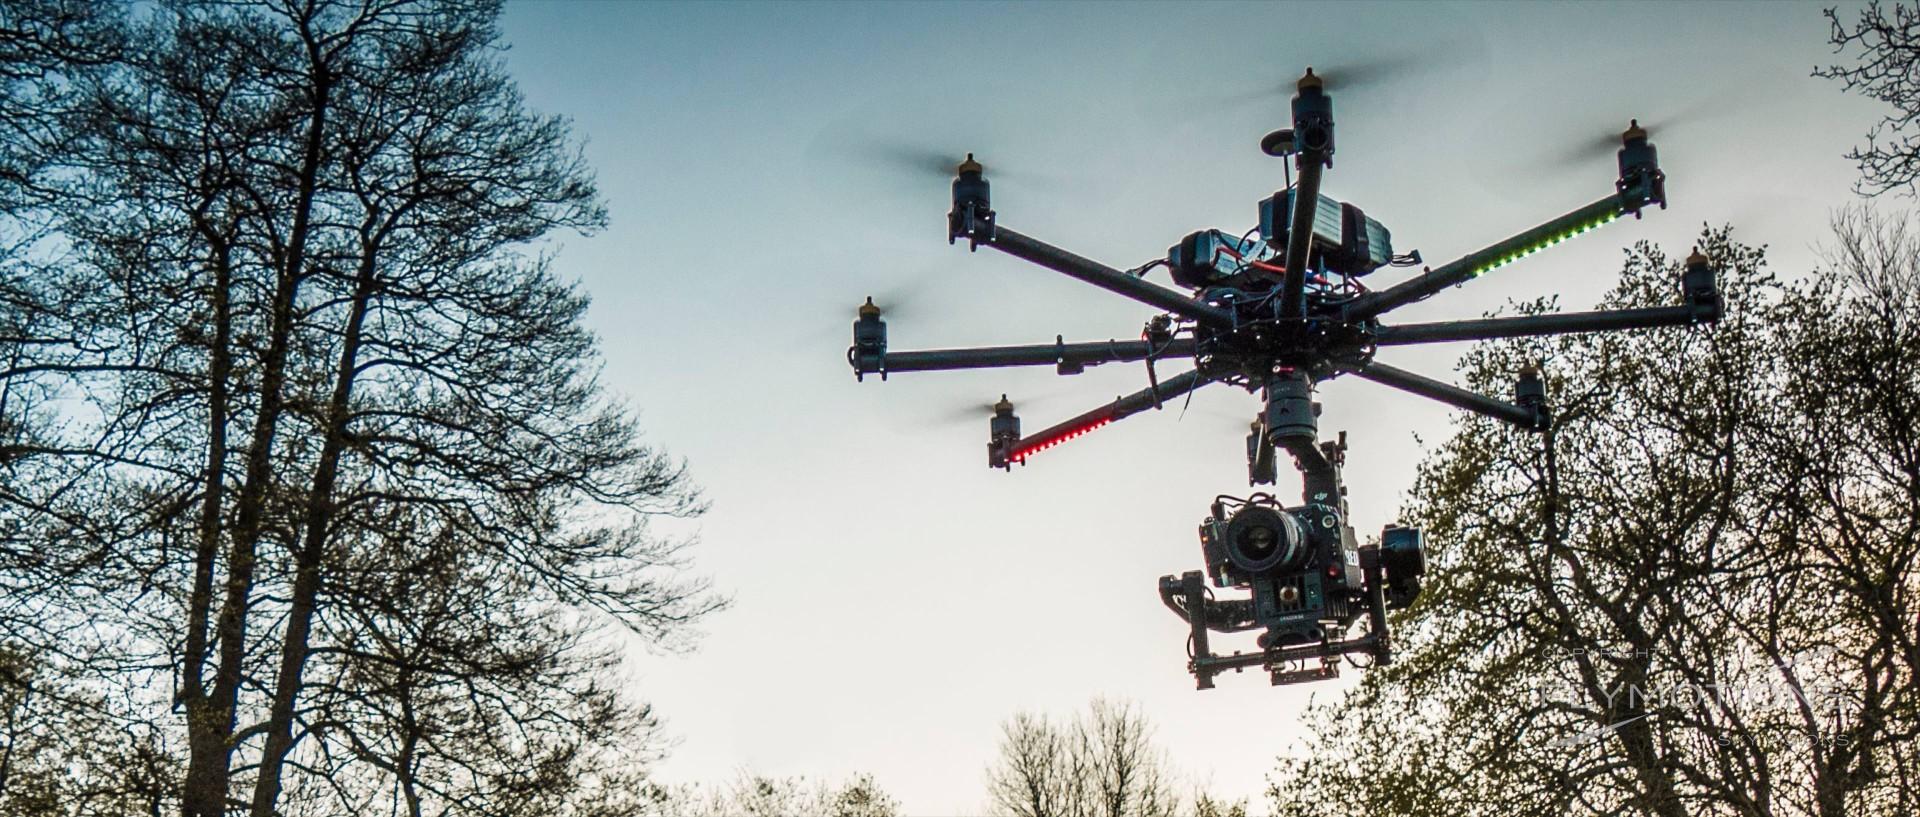 drone-cinestar8-octocopter-reddragon aerials